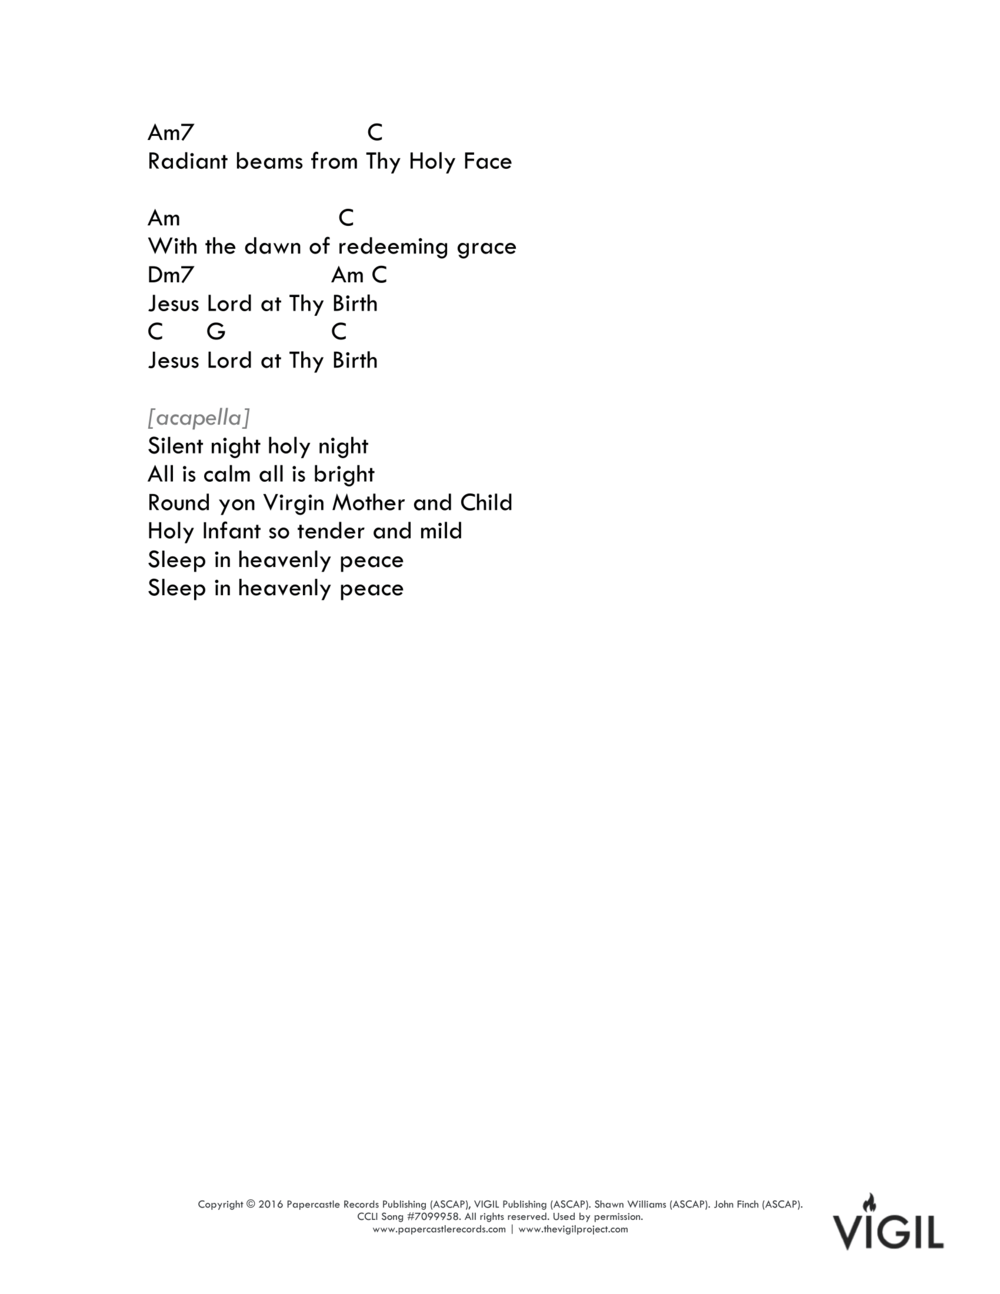 VIGIL S2 - Silent Night (C Major)-2.png